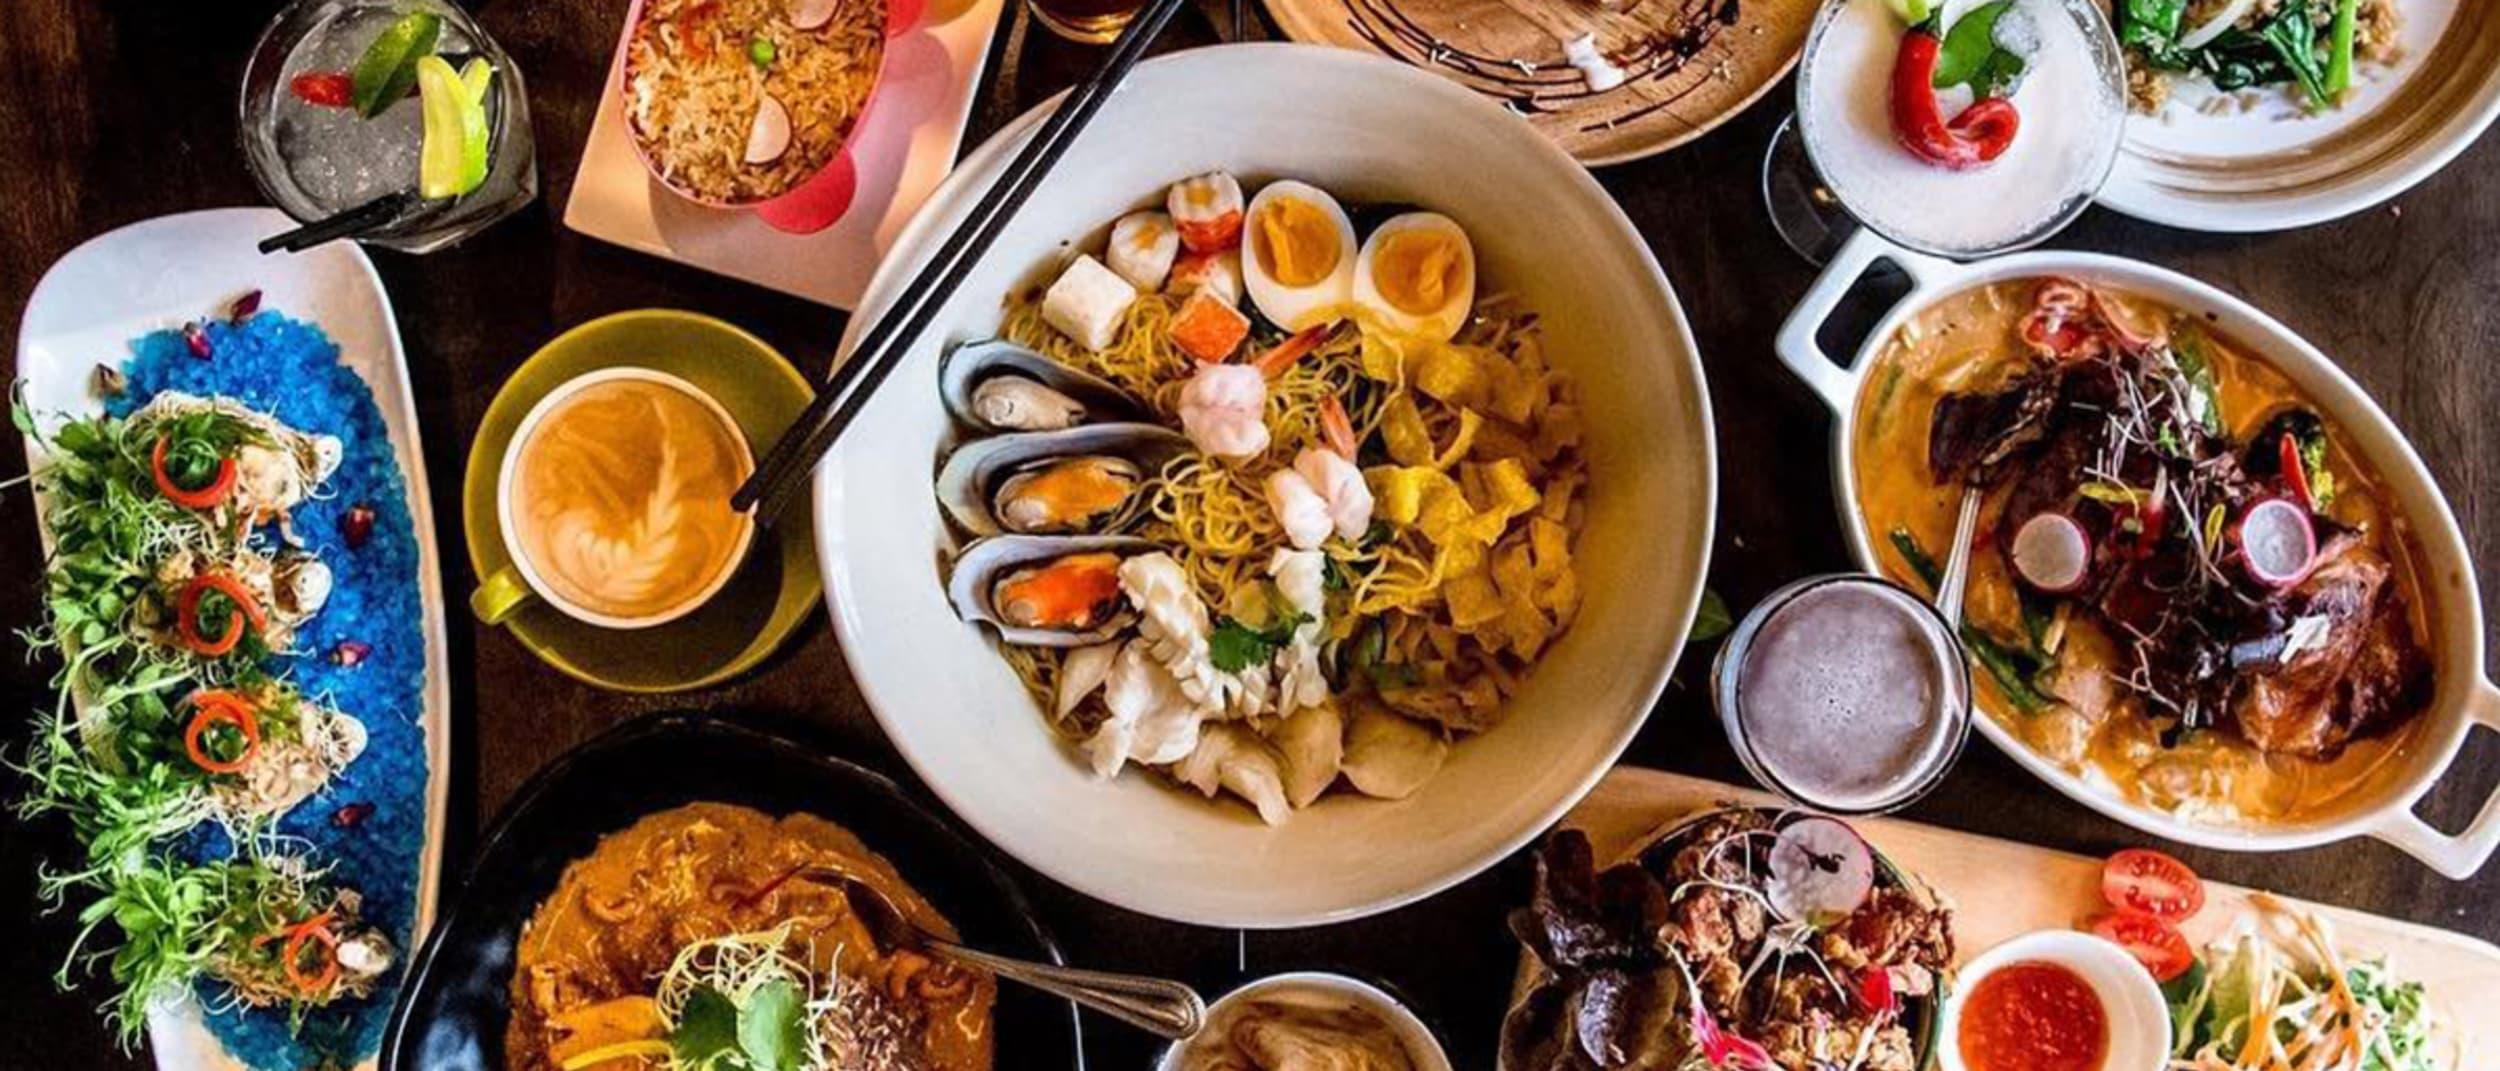 Bangkok Brothers: New scrumptious menu items